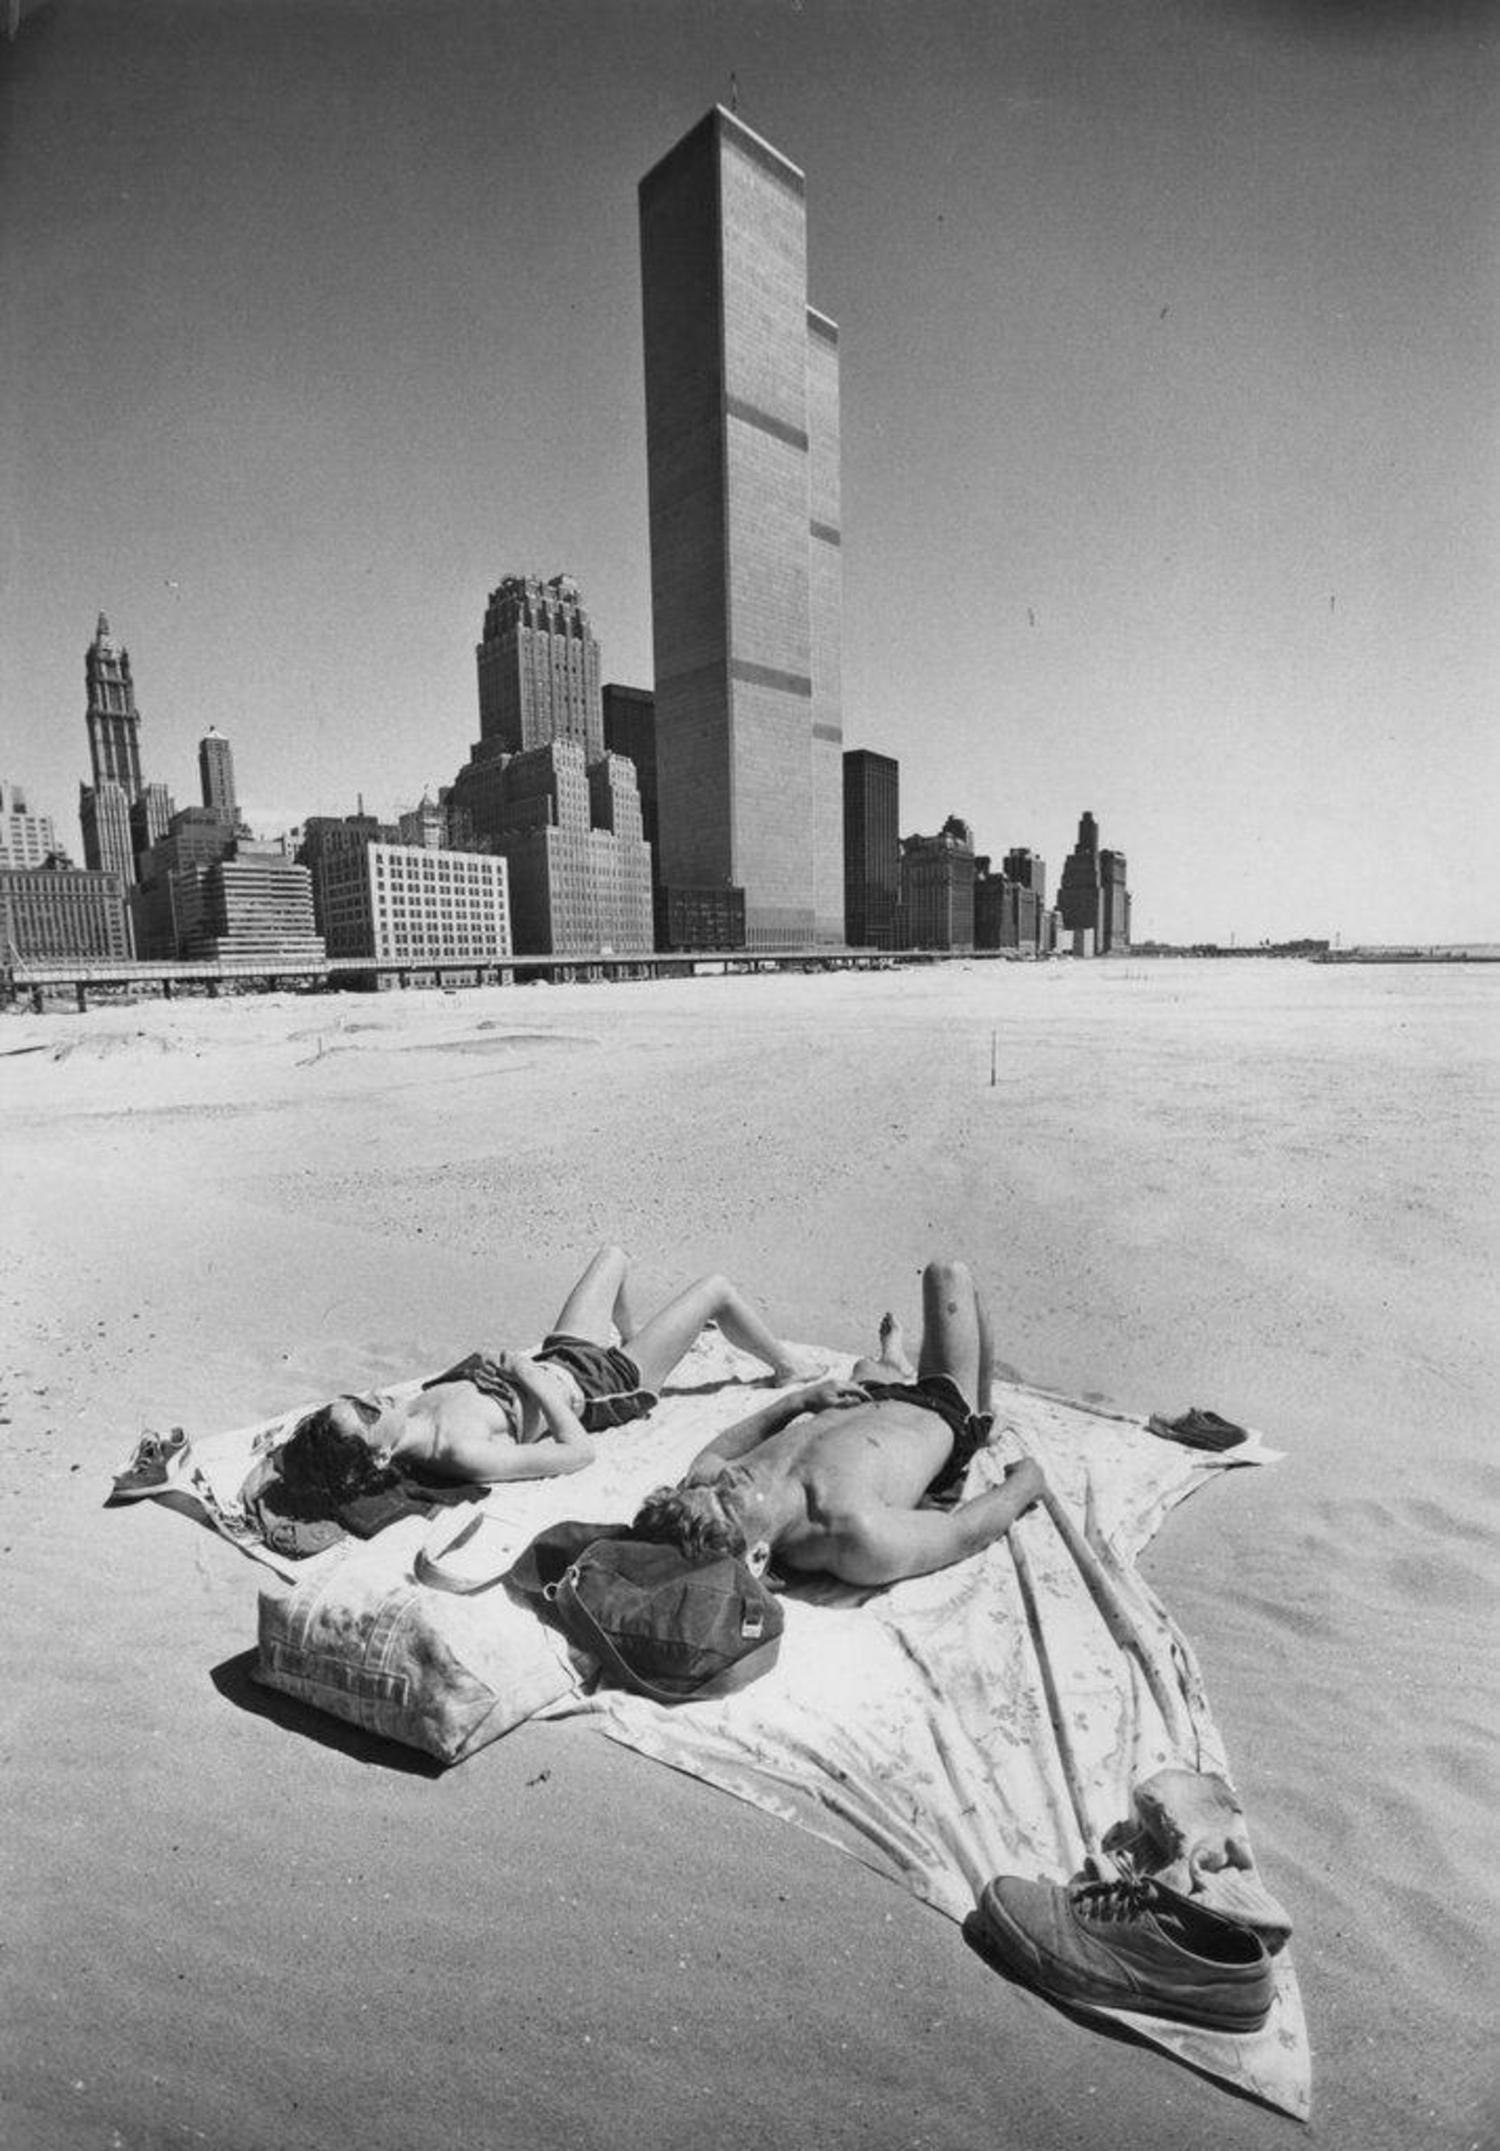 Battery Park City, 1977